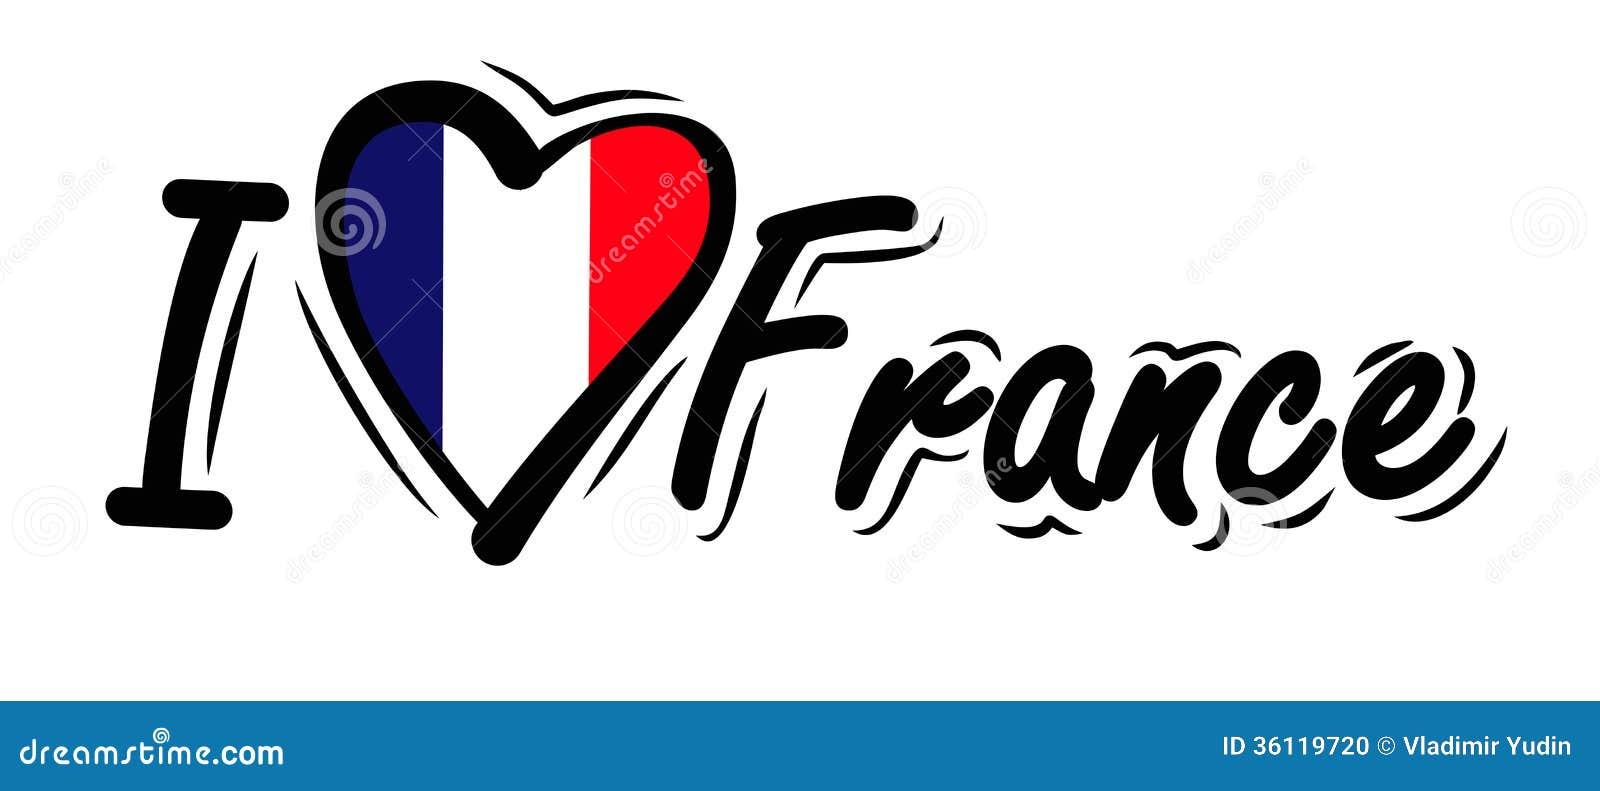 I Love France Vector Stock Photo Image 36119720